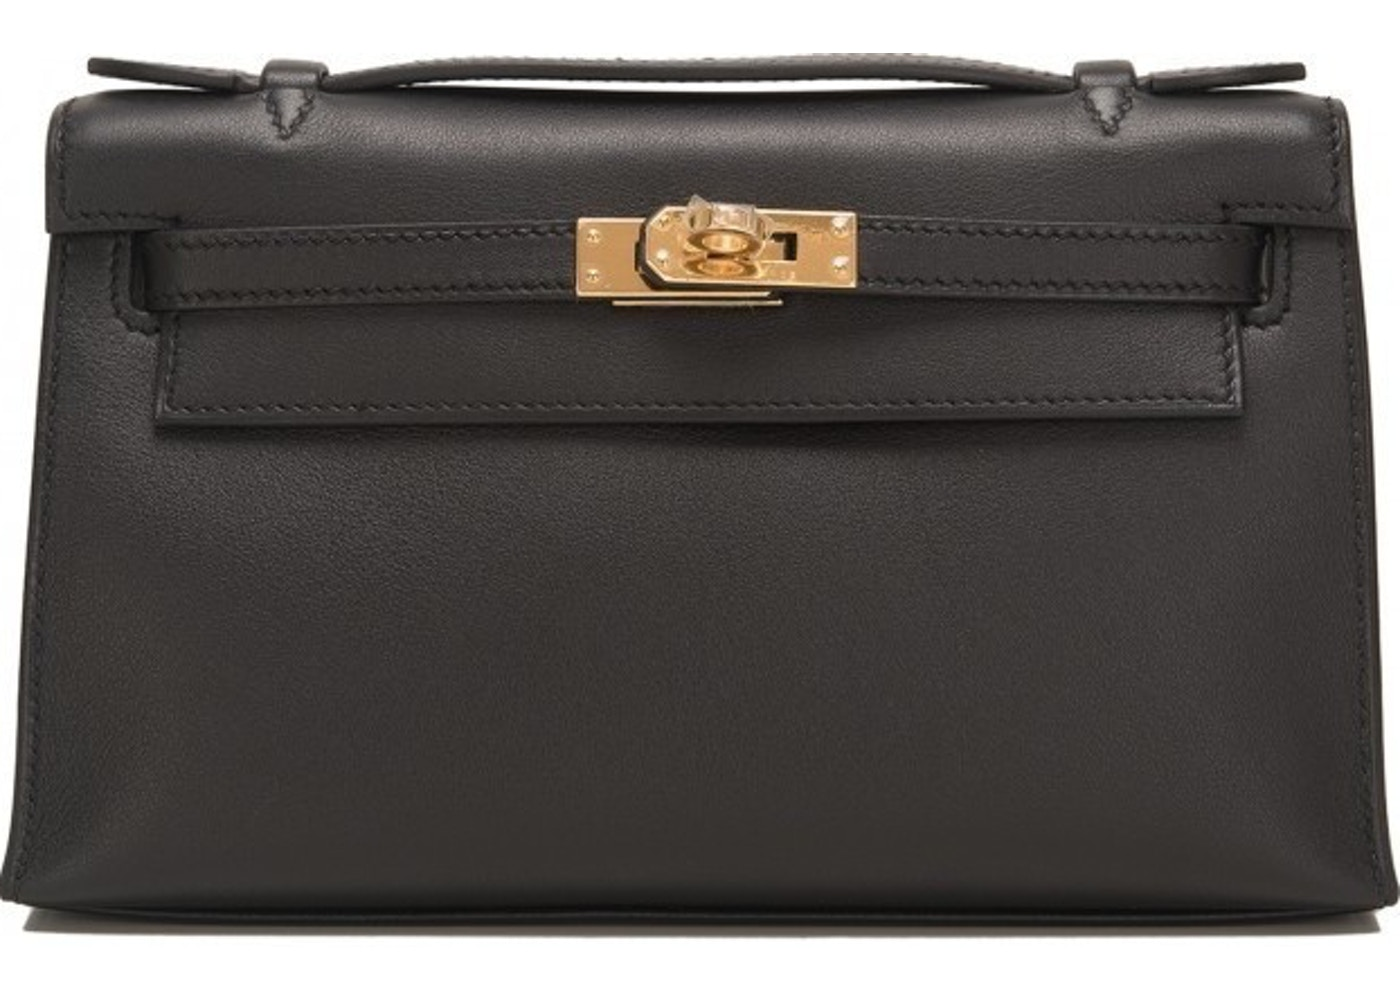 19667d3b90e1 Sell. or Ask. View All Bids. Hermes Kelly Pochette Swift Mini Black